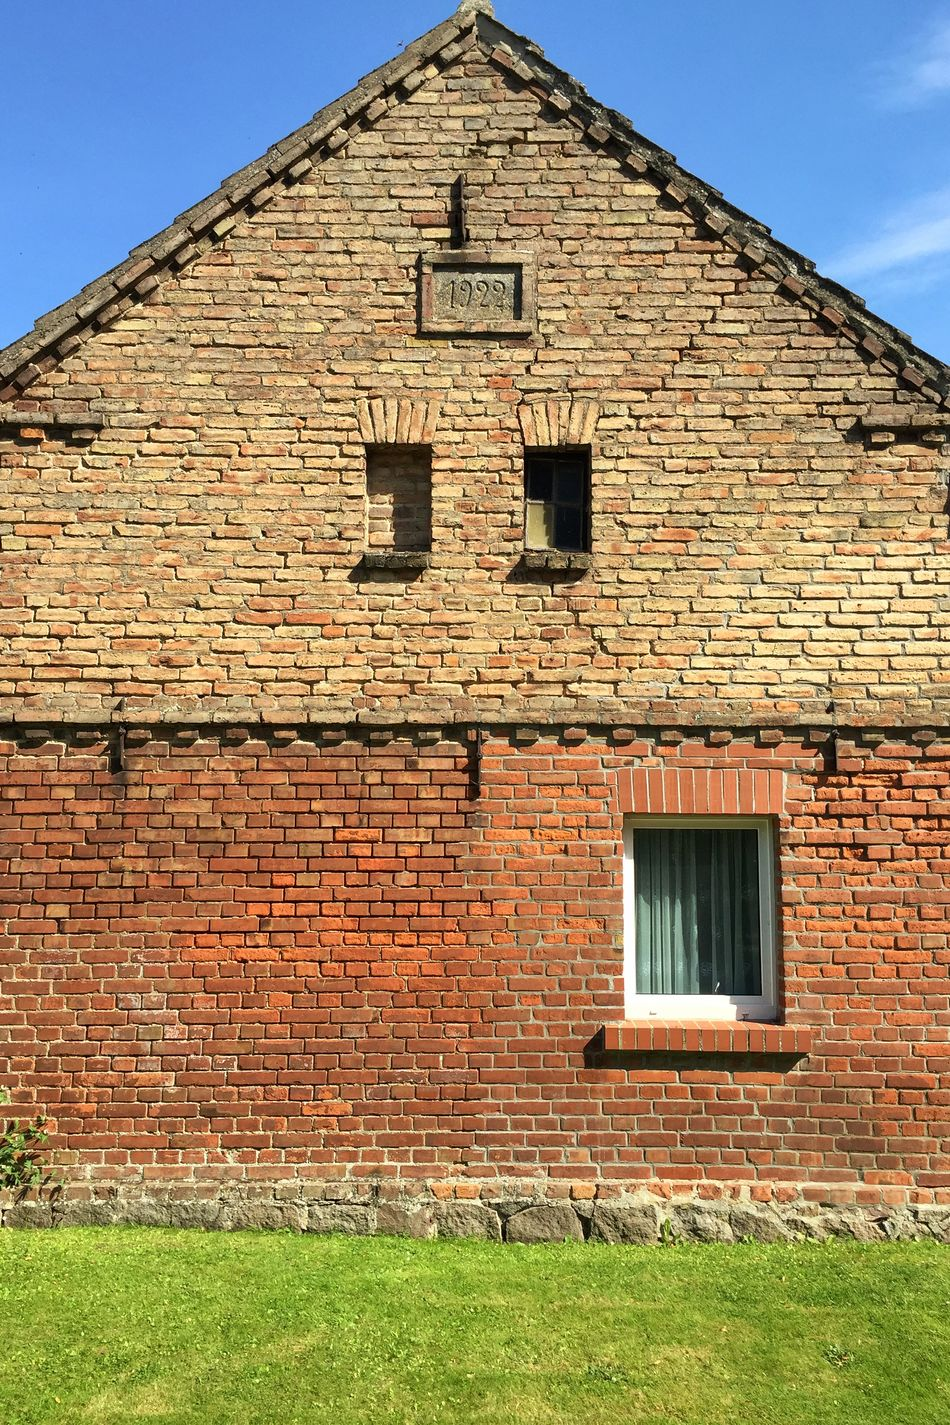 Bricks Brickporn Old Brick Houses Schorfheide Barnimerland Chorin Brandenburg